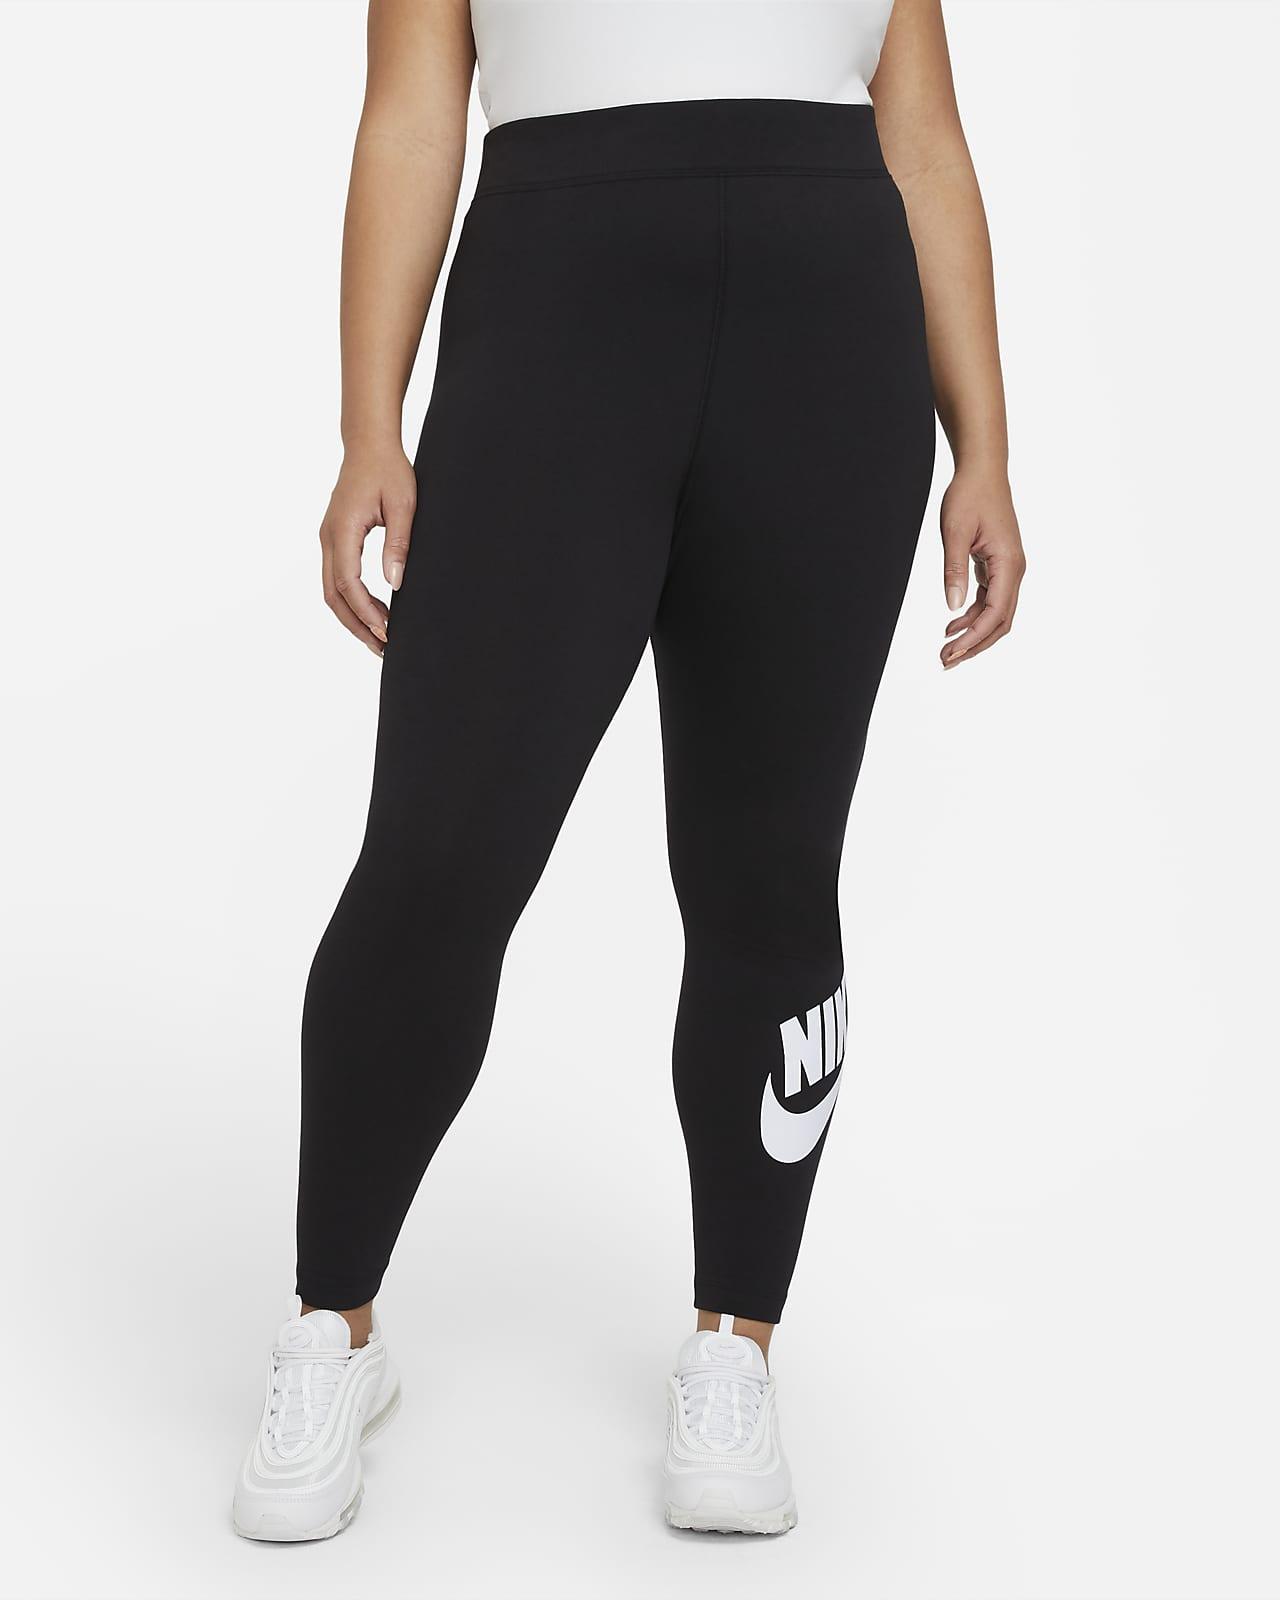 Leggings de cintura alta para mujer talla grande Nike Sportswear Essential